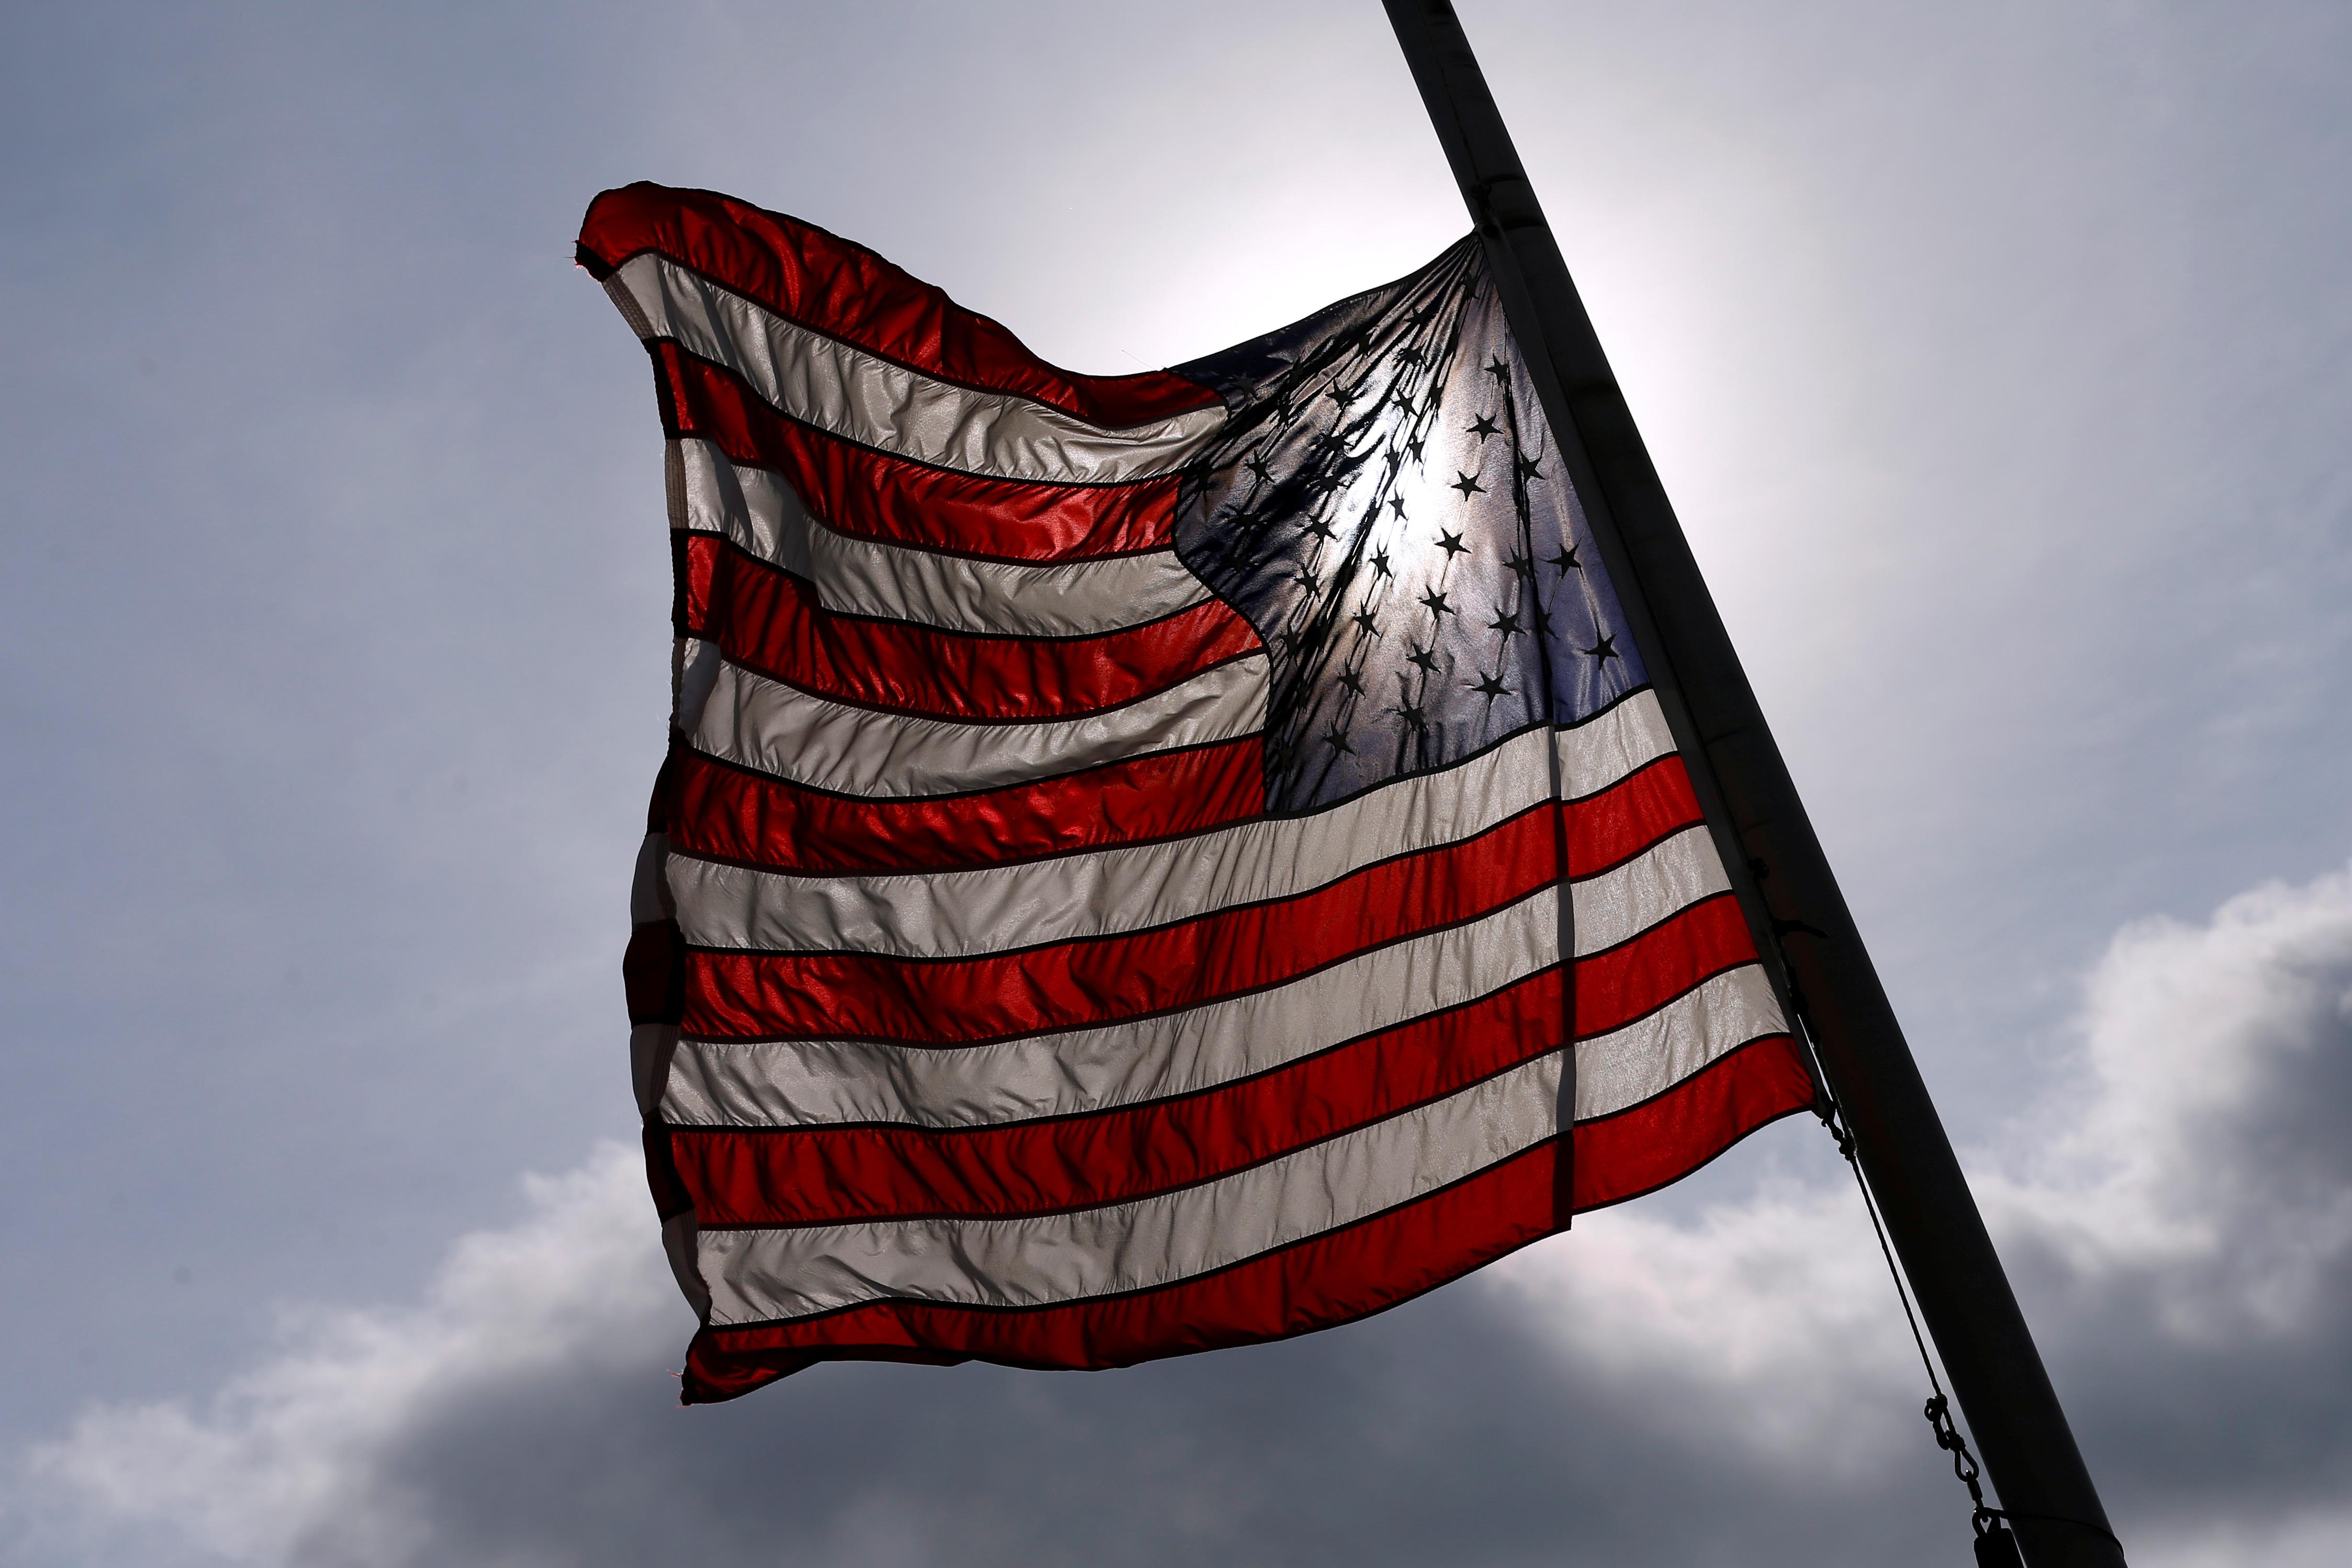 An American flag is seen at half-mast.